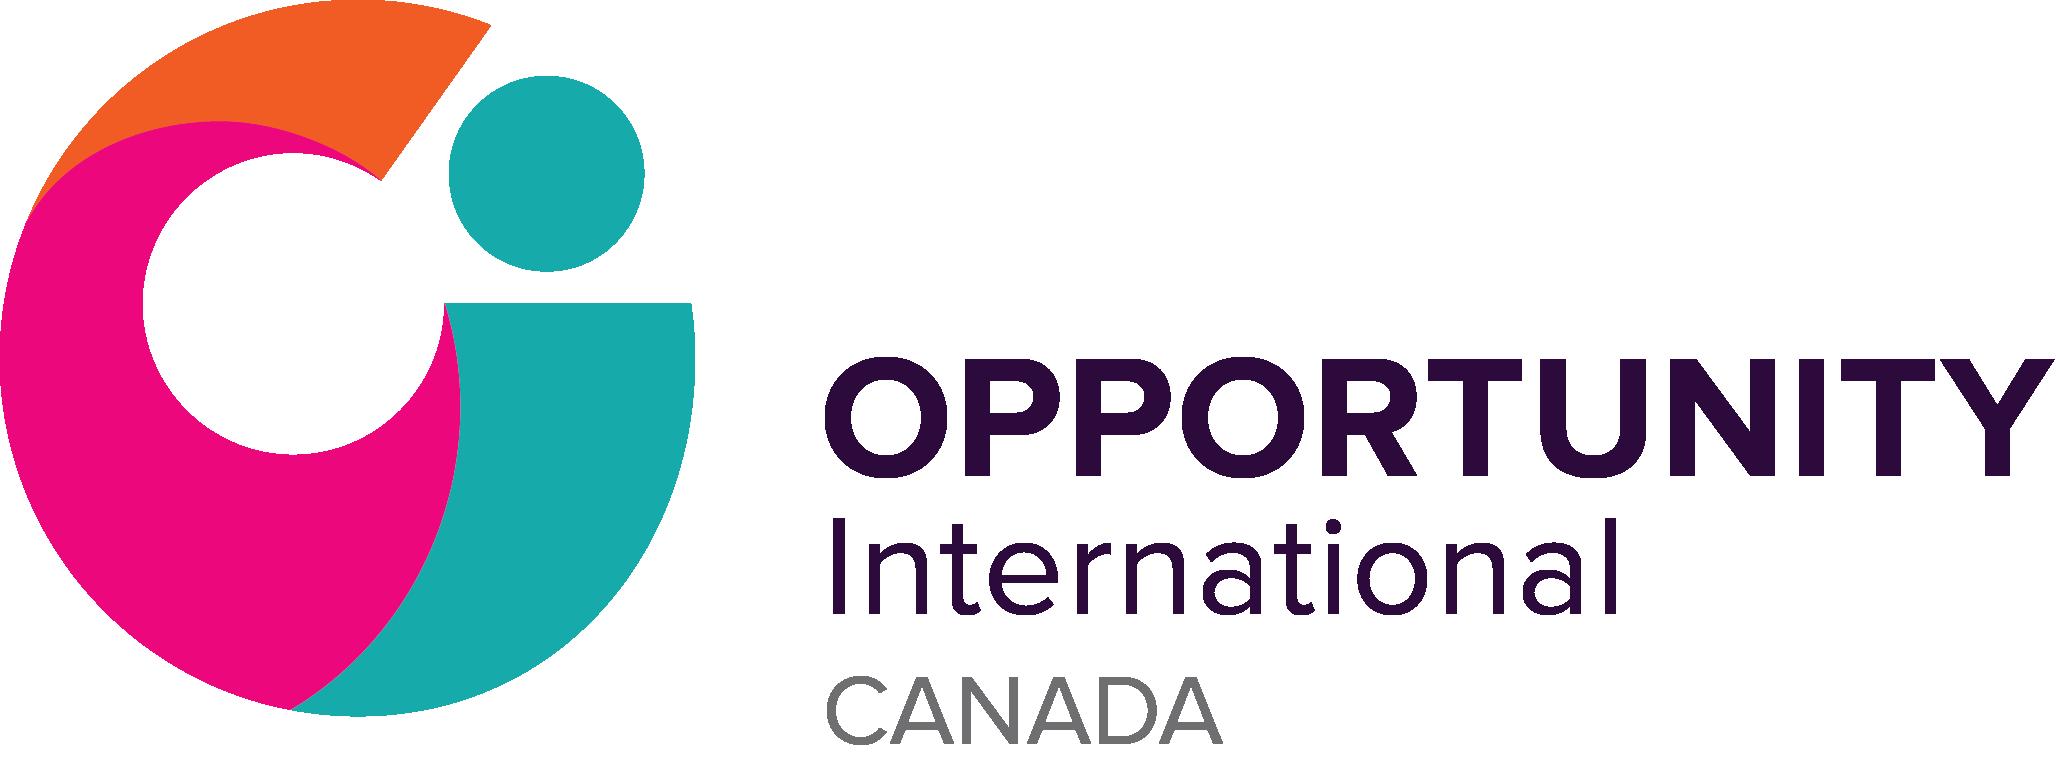 opportunity intl 1